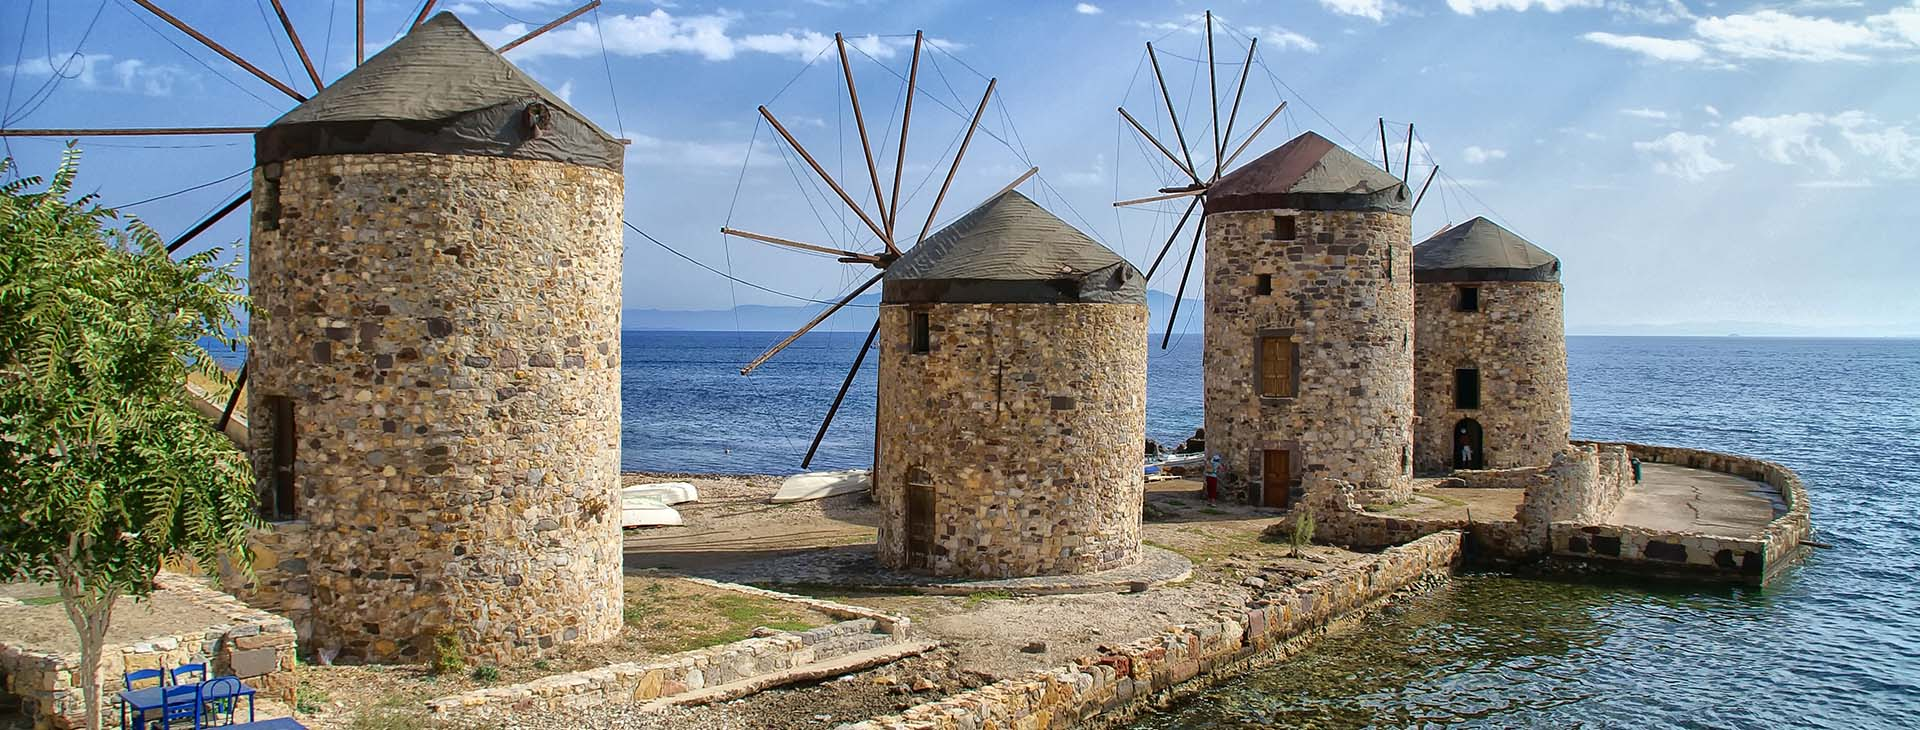 Windmills, Chios island